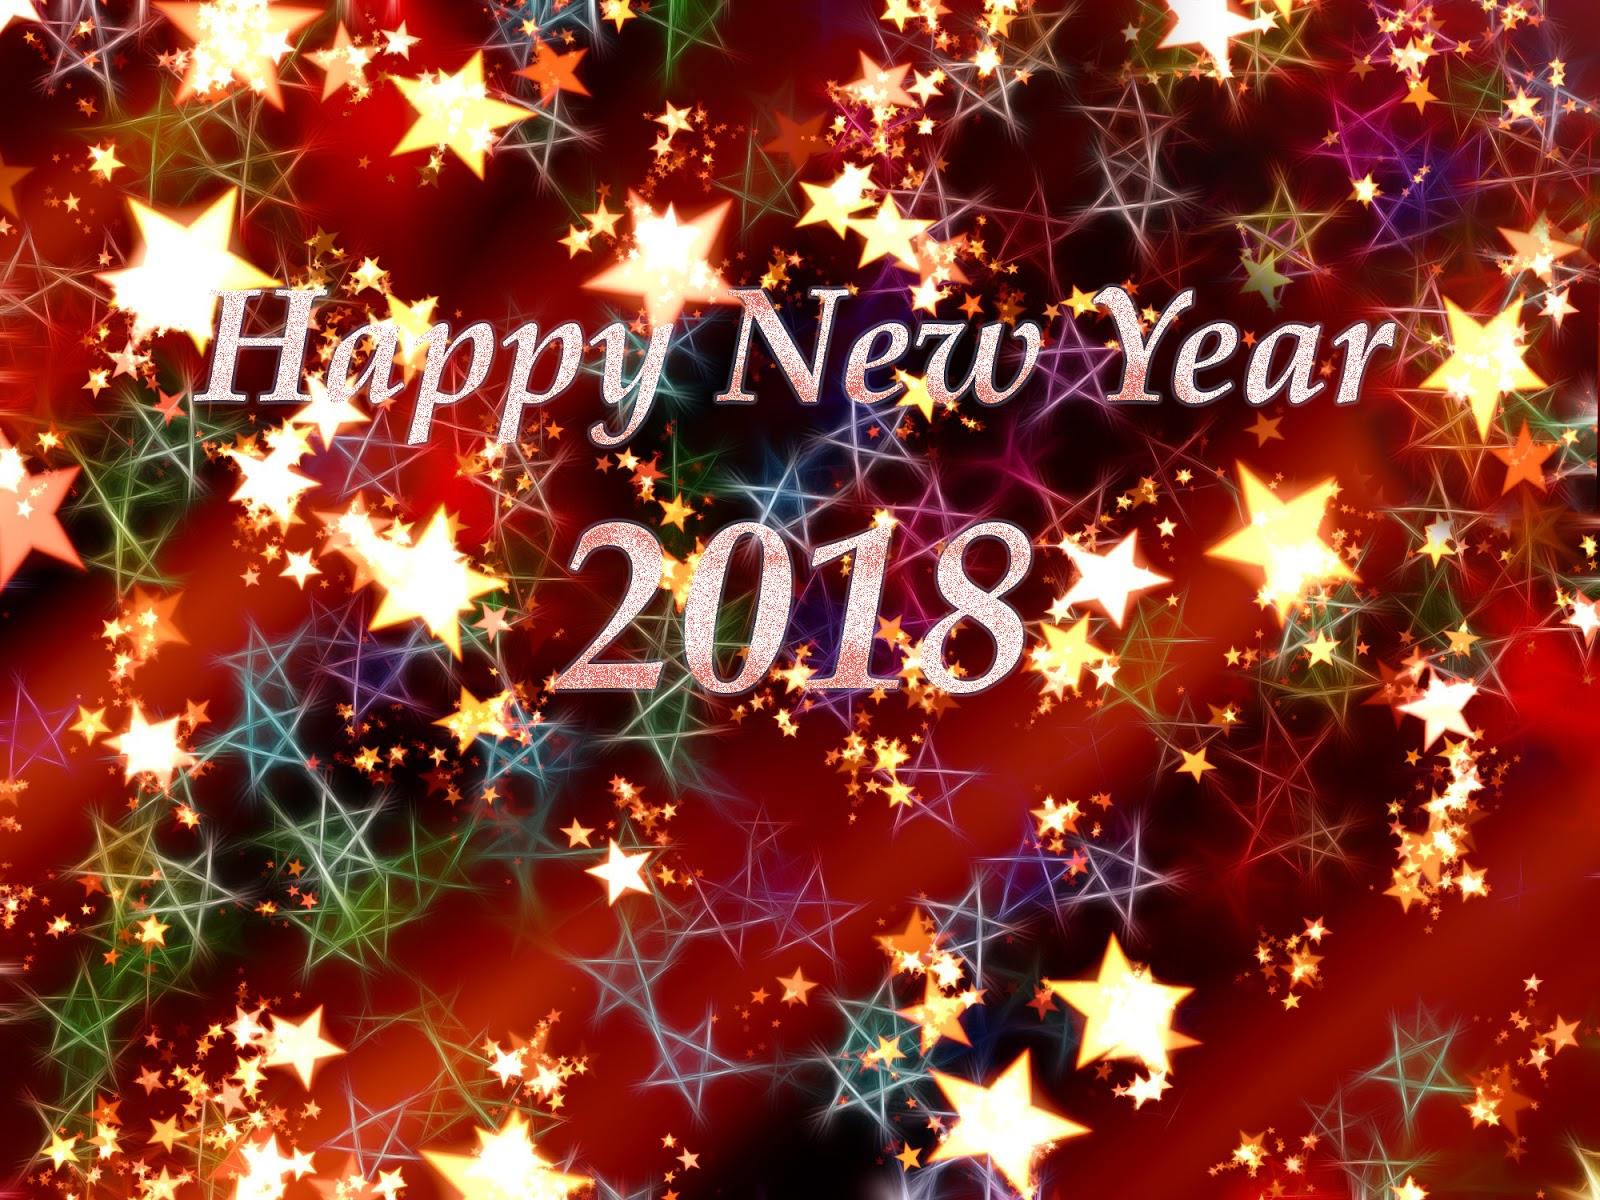 1600x1200 px 2018 wallpaper happy new year 2018 happy new year wallpapers hd new years wallpapers